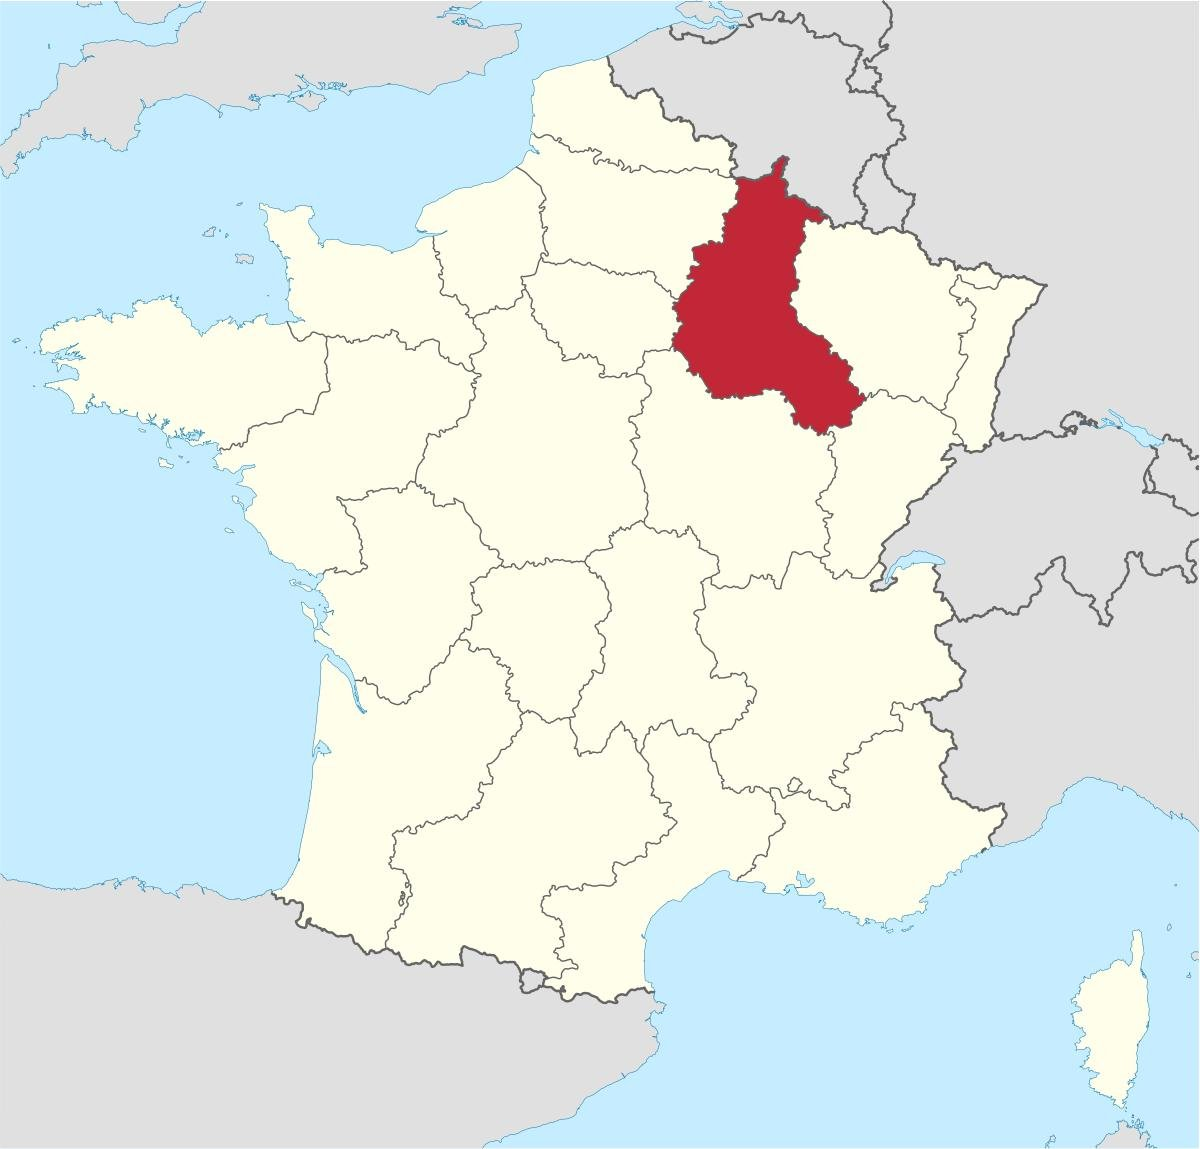 Тот самый регион Шампань на карте